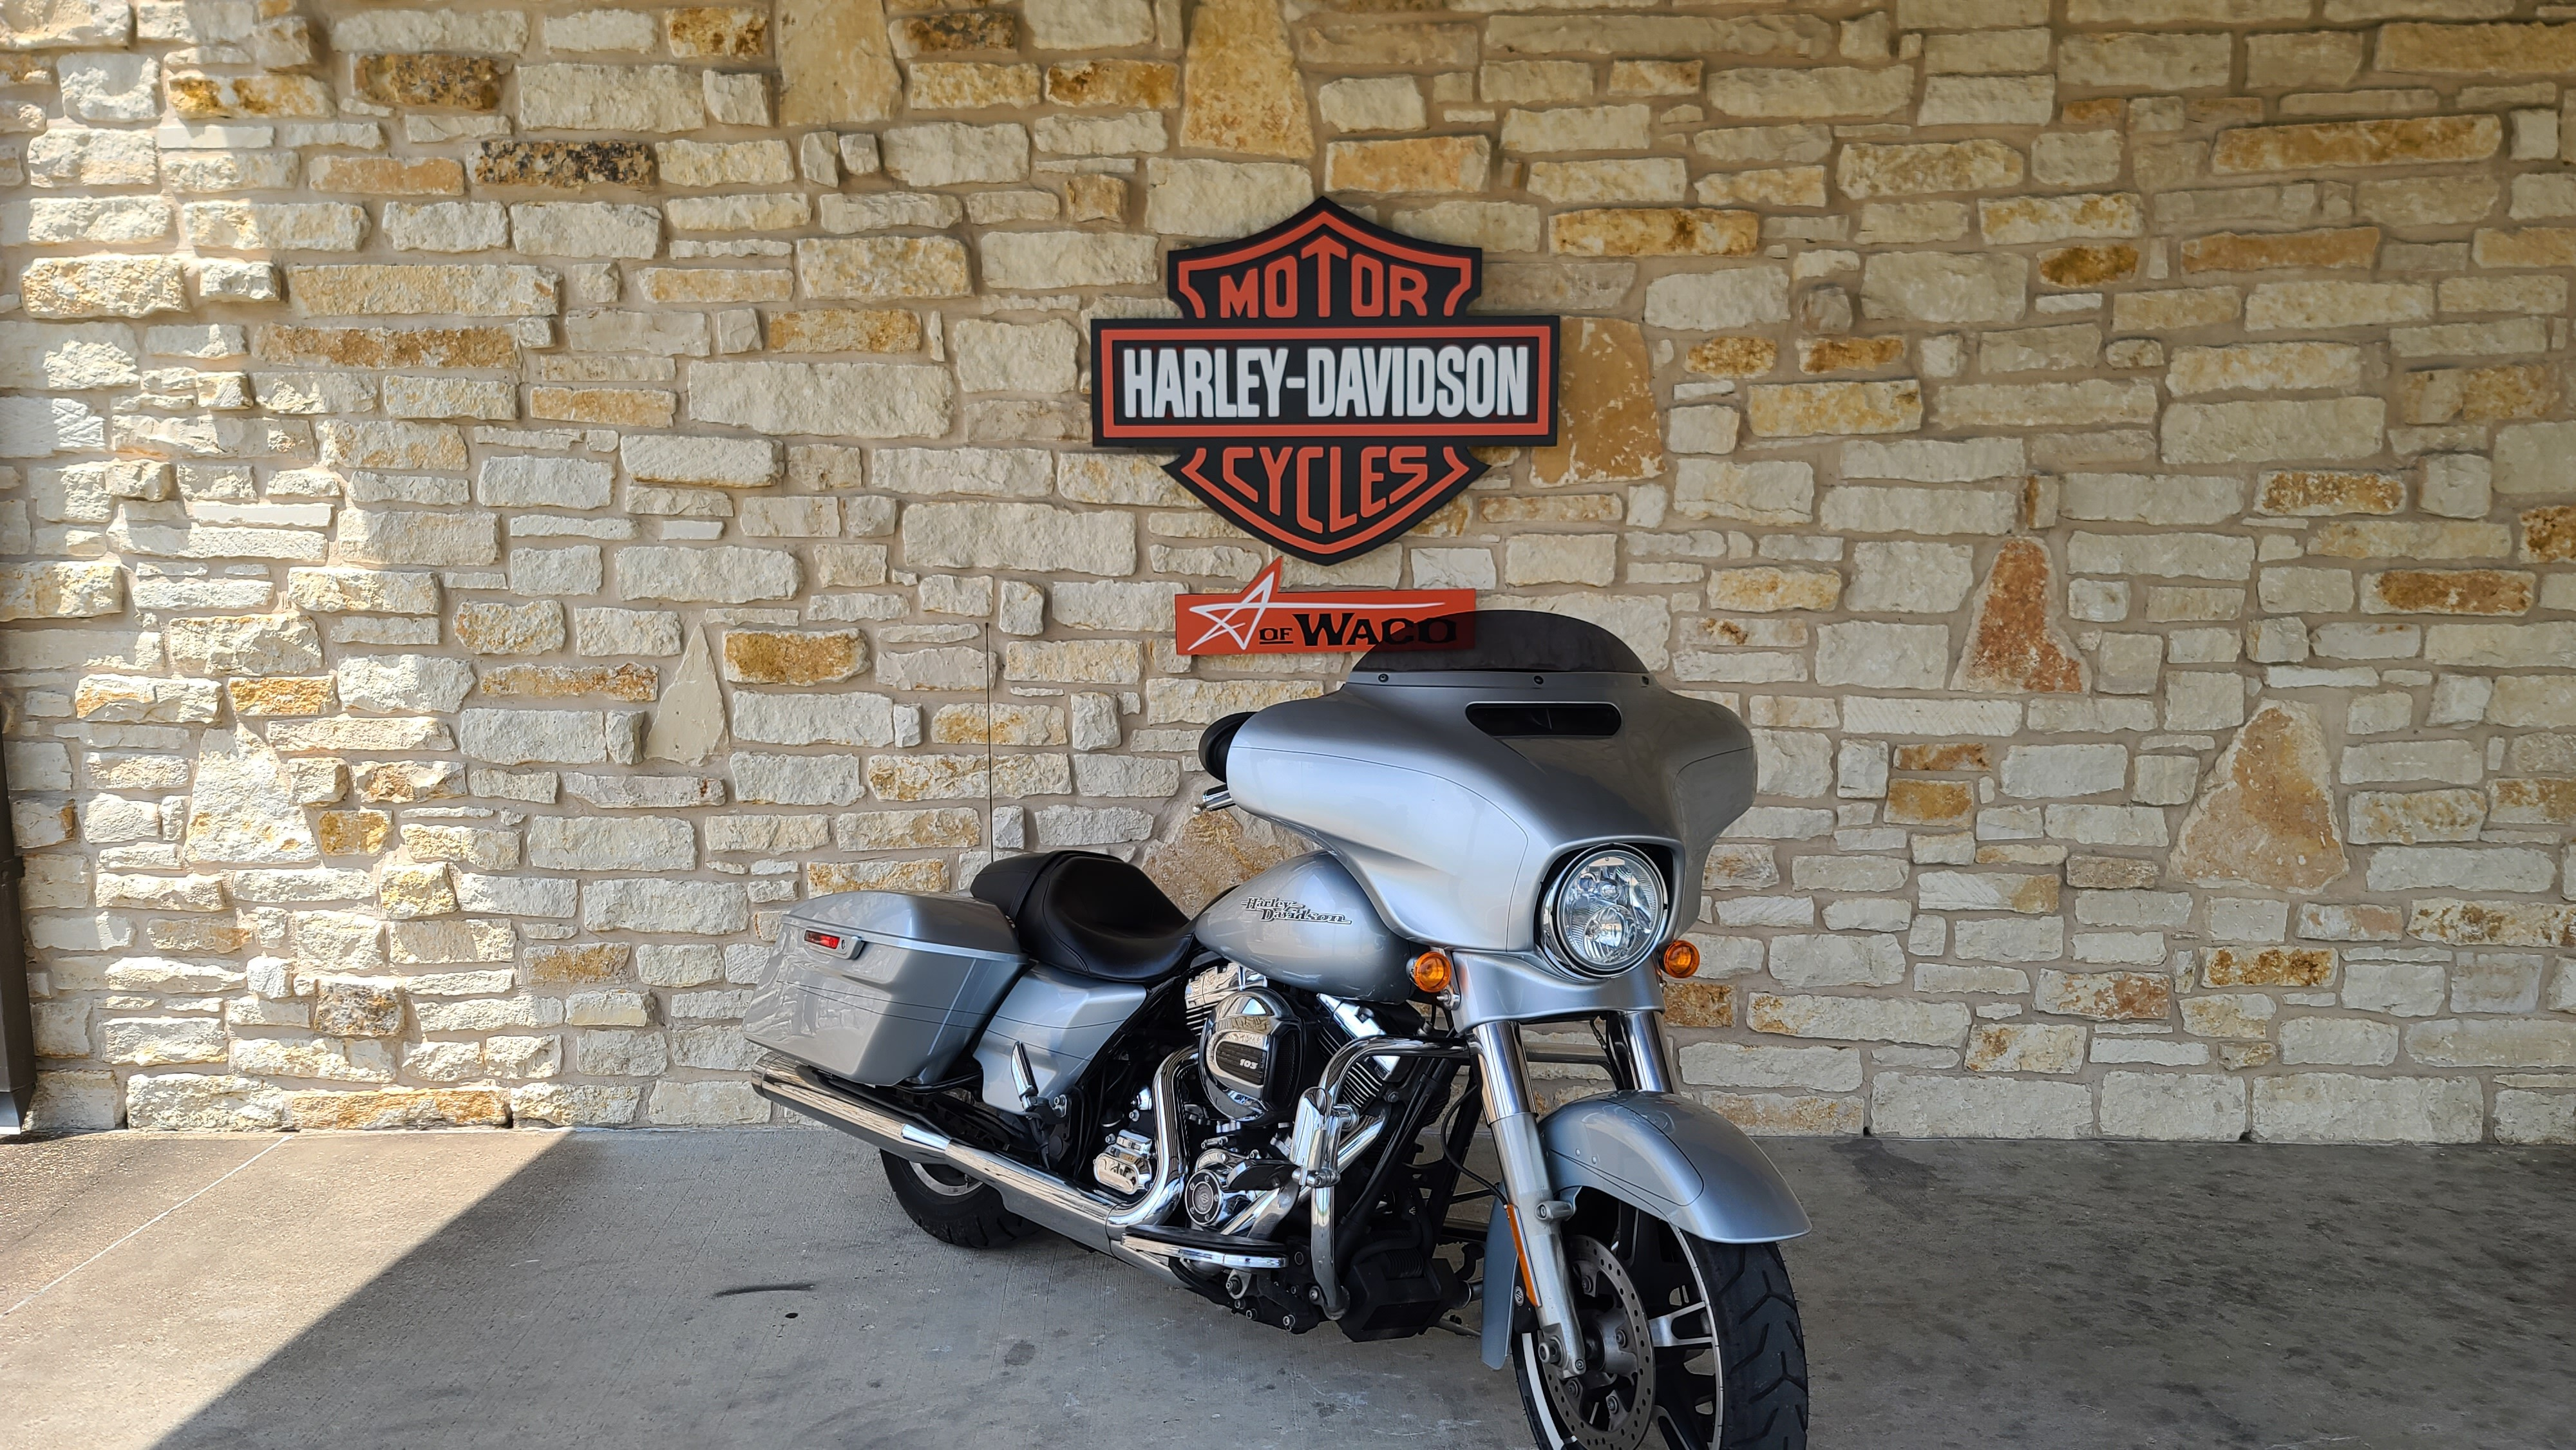 2015 Harley-Davidson Street Glide Base at Harley-Davidson of Waco